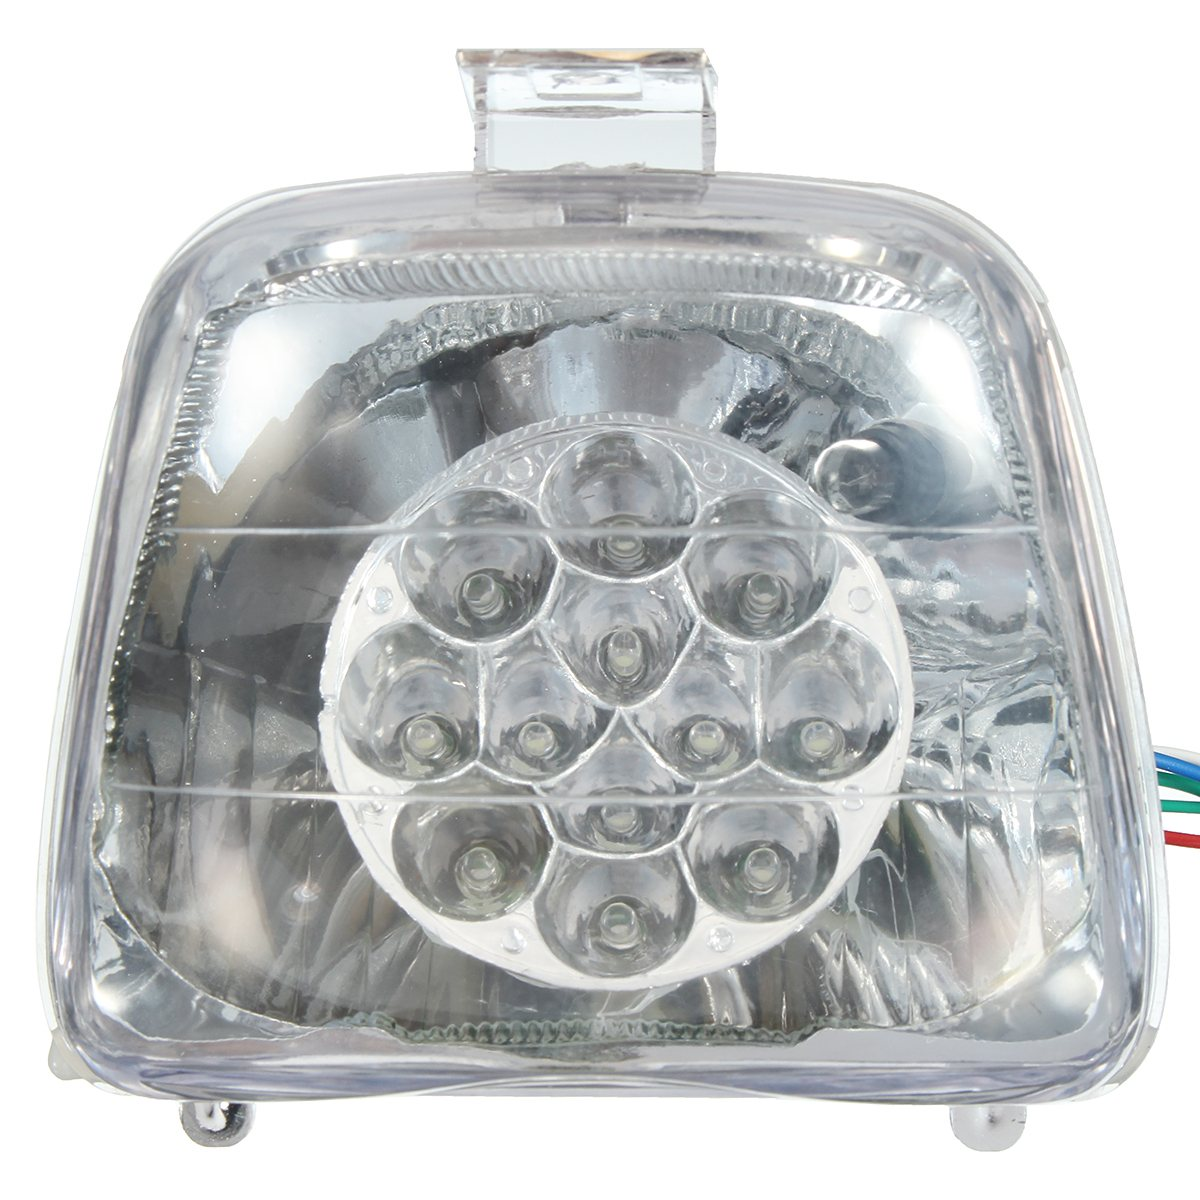 Automobiles & Motorcycles Atv Front Light Headlight For 50cc 70cc 90cc 110cc 125cc Mini Atv Quad Bike Buggy